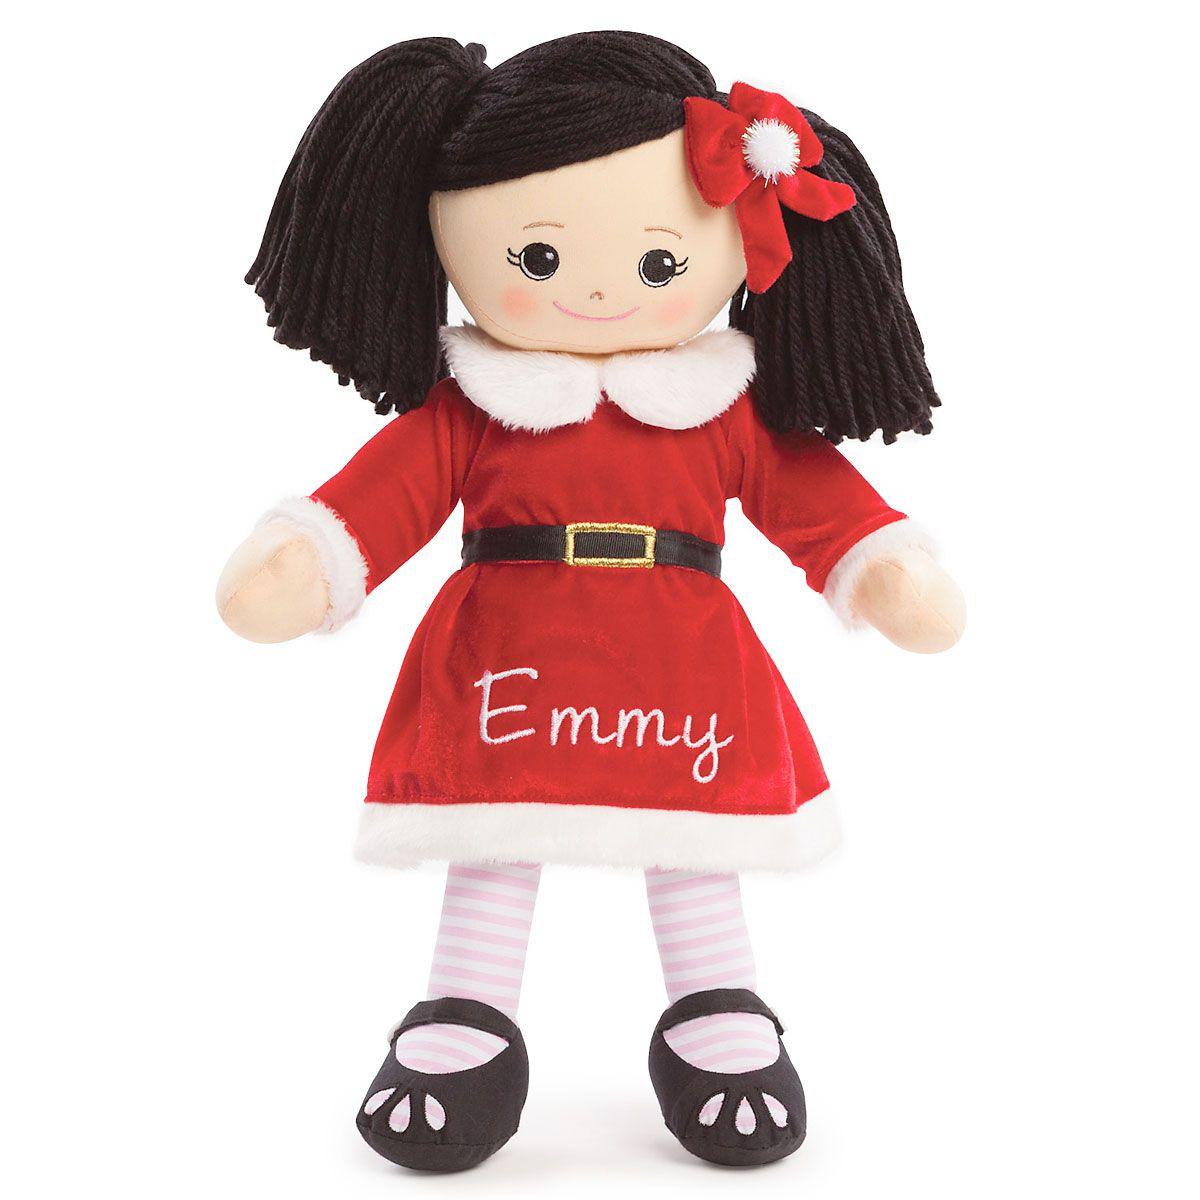 Personalized Asian Rag Doll in Santa Dress